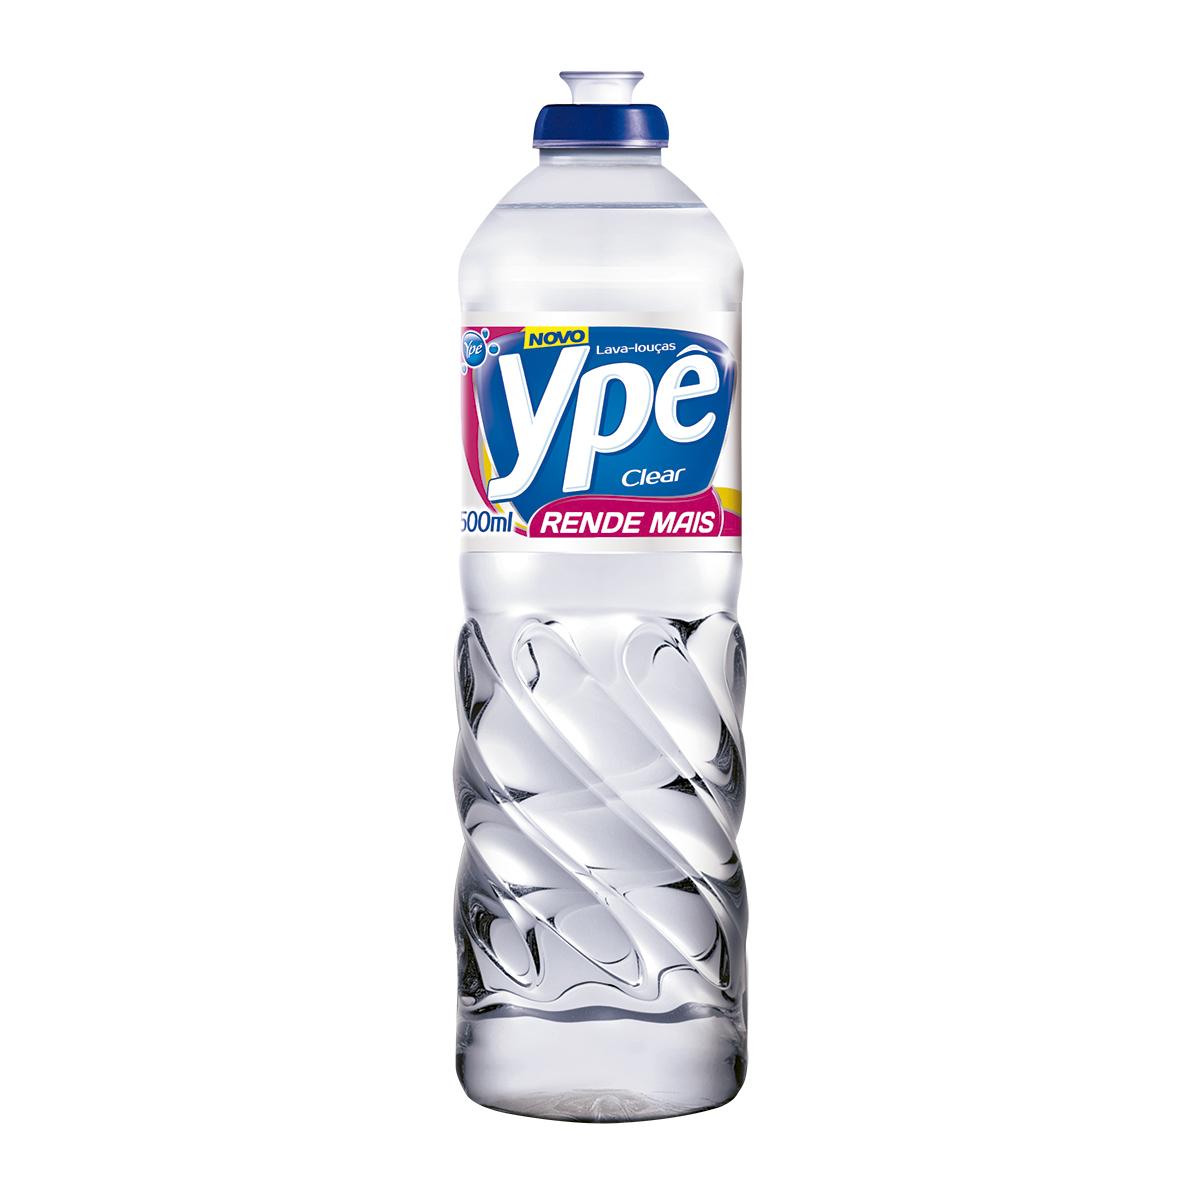 DETERGENTE CLEAR 500ML YPE